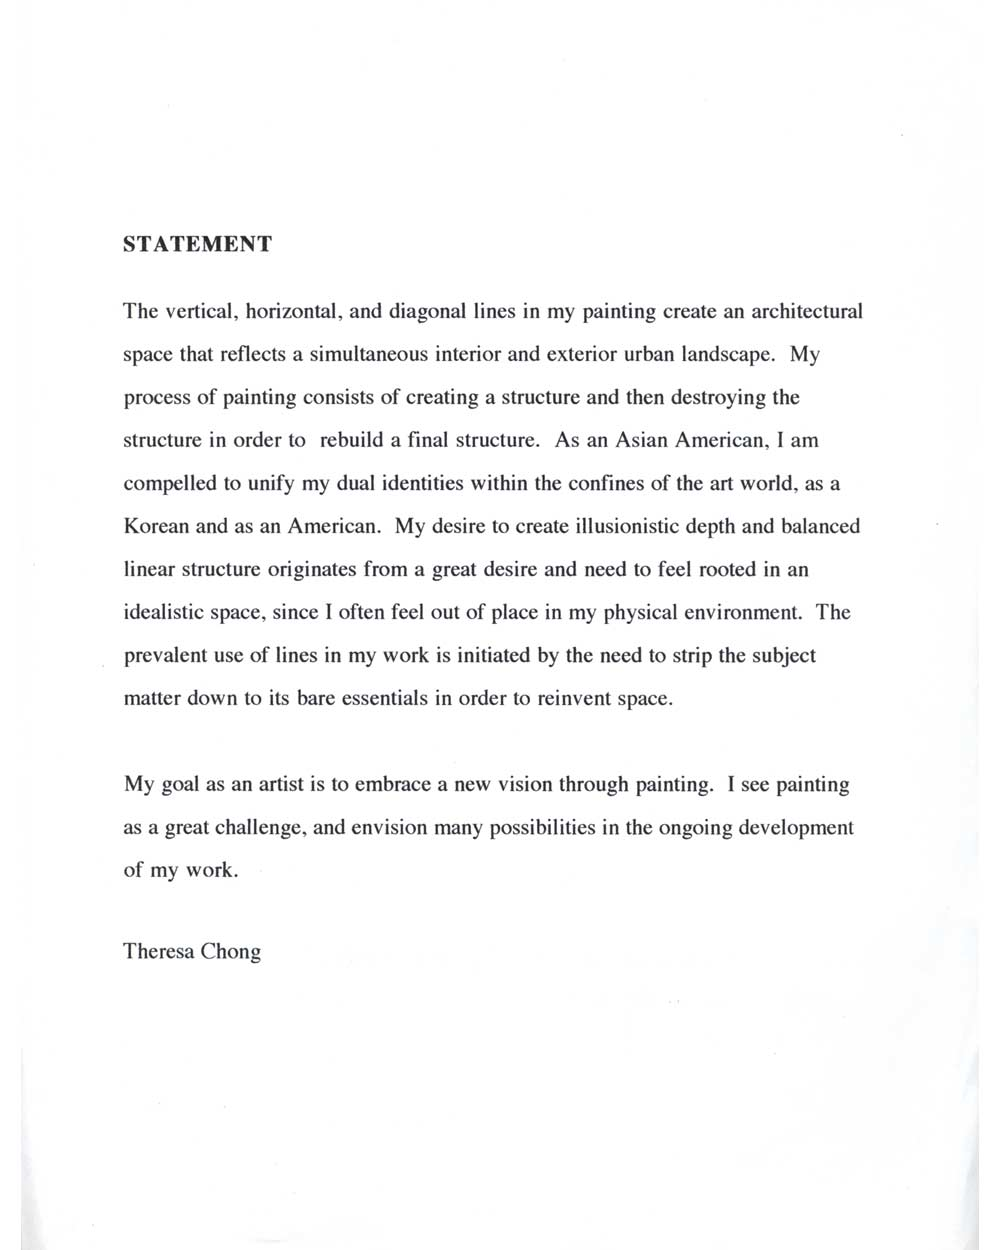 Theresa Chong's Artist Statement, pg 1